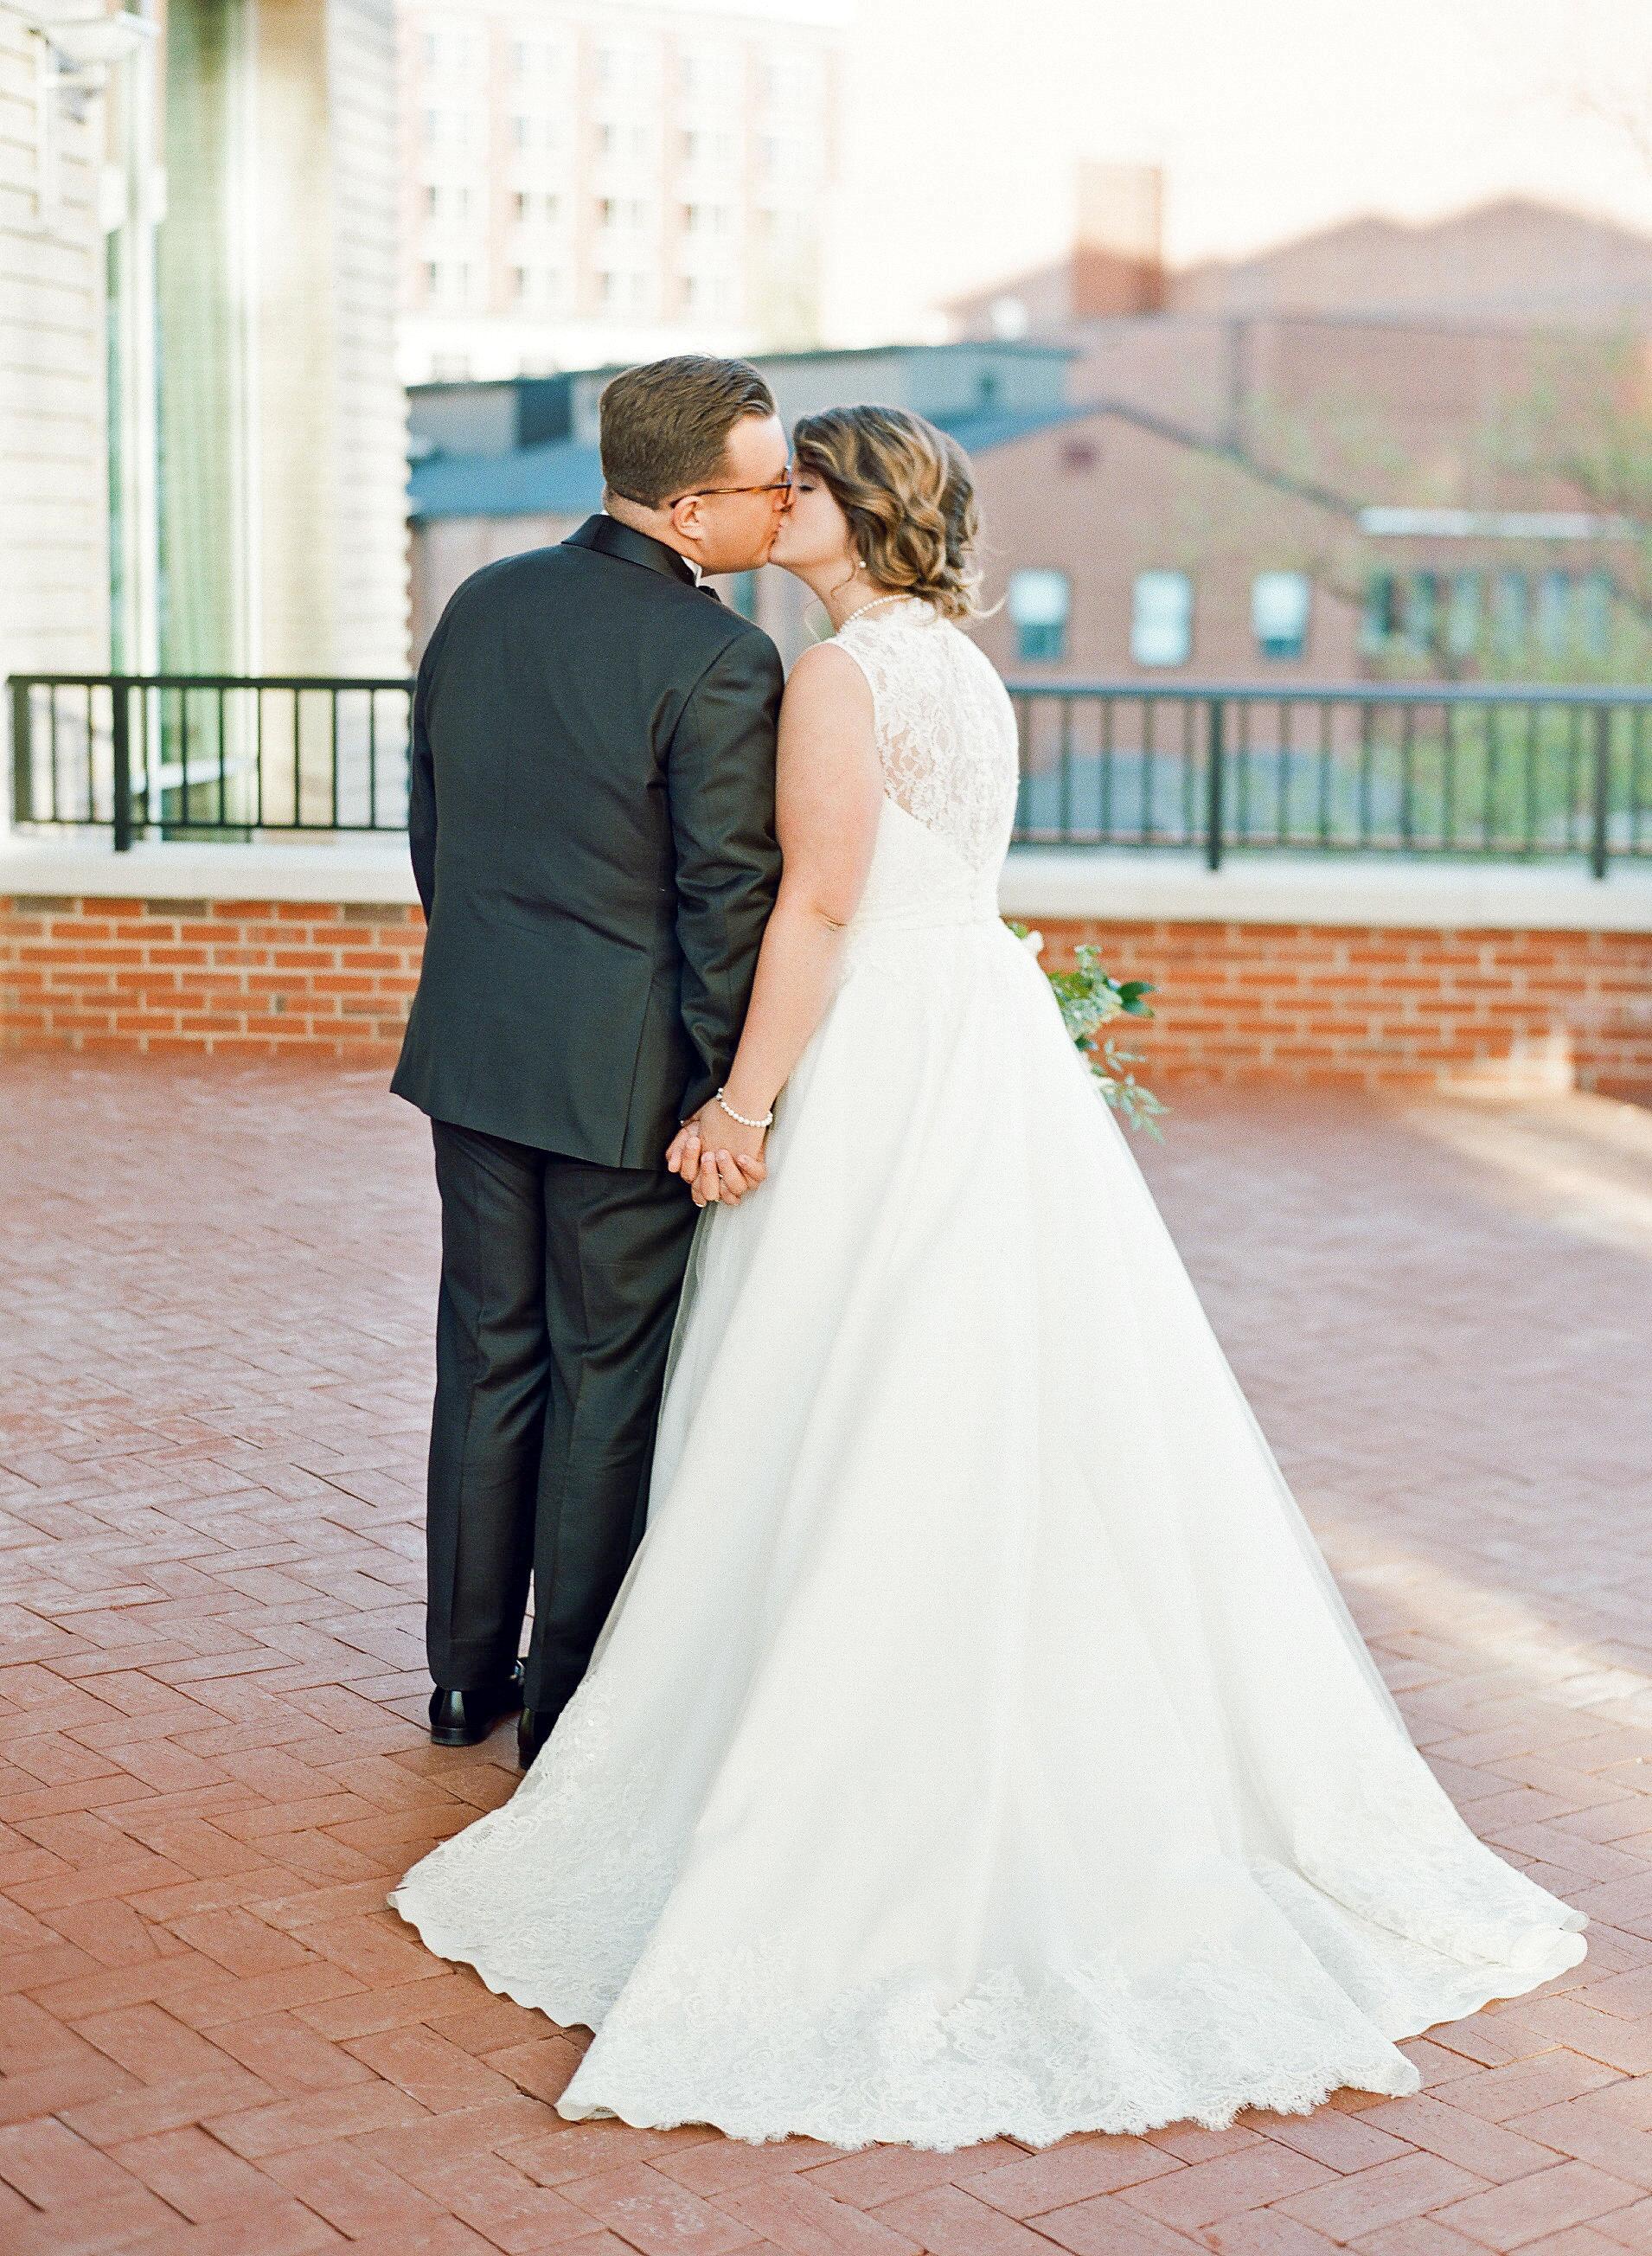 carey jared wedding couple kiss